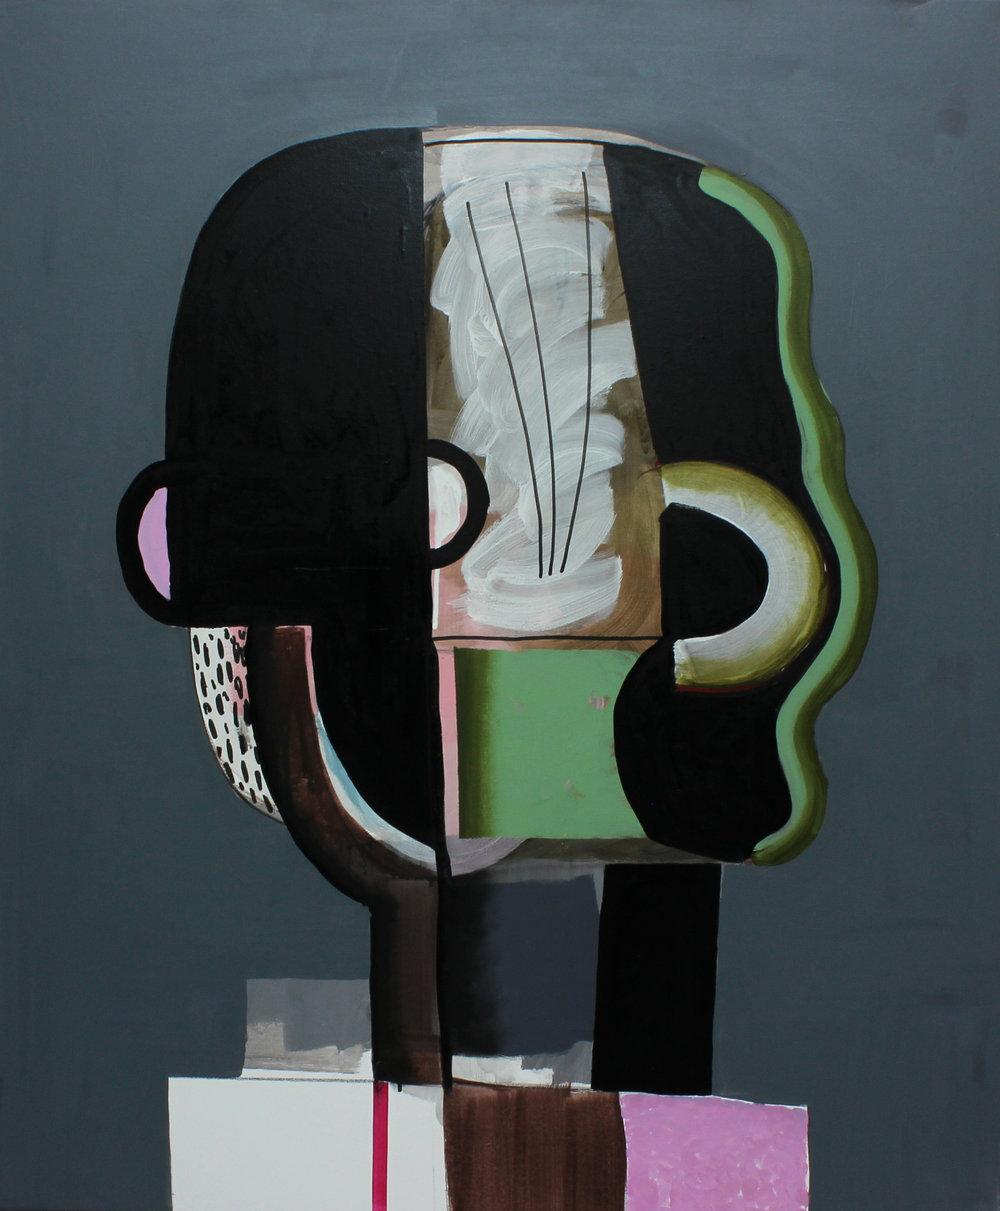 Image.: Oliver Gröne, Head full of steam, 2019, Acrylic and oil on canvas, 120 x 100 cm